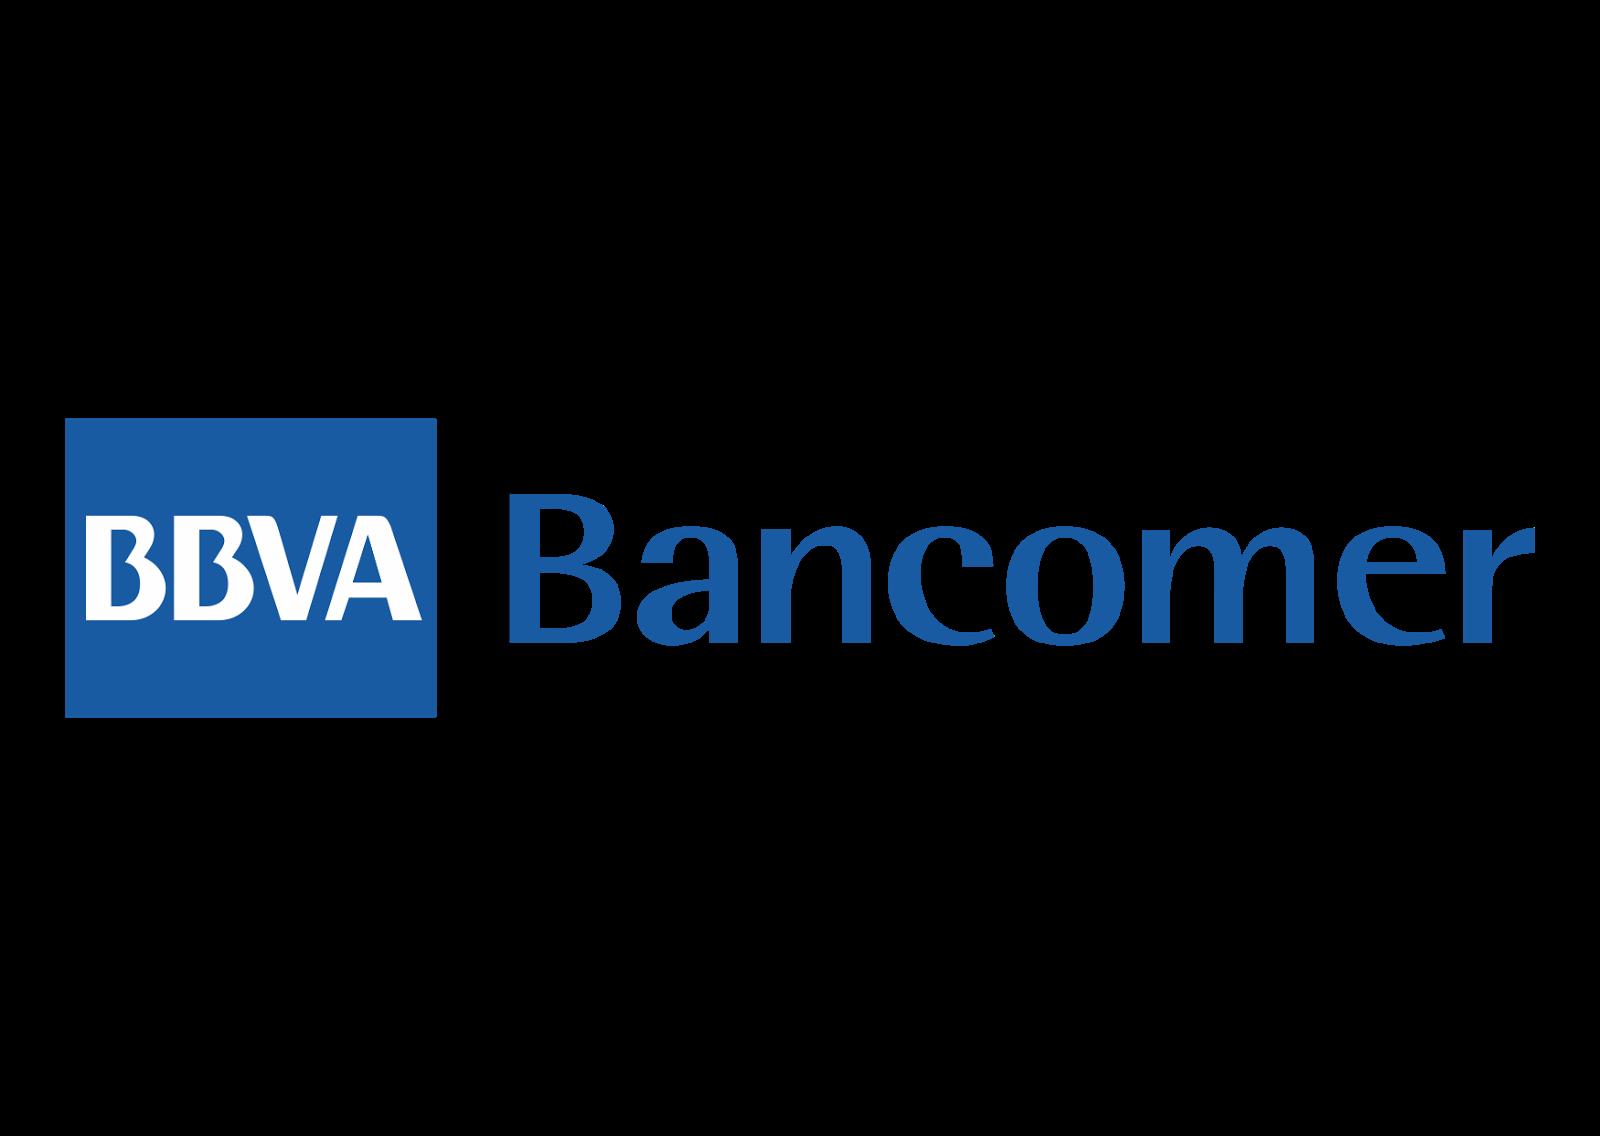 bbva bancomer samsung pay